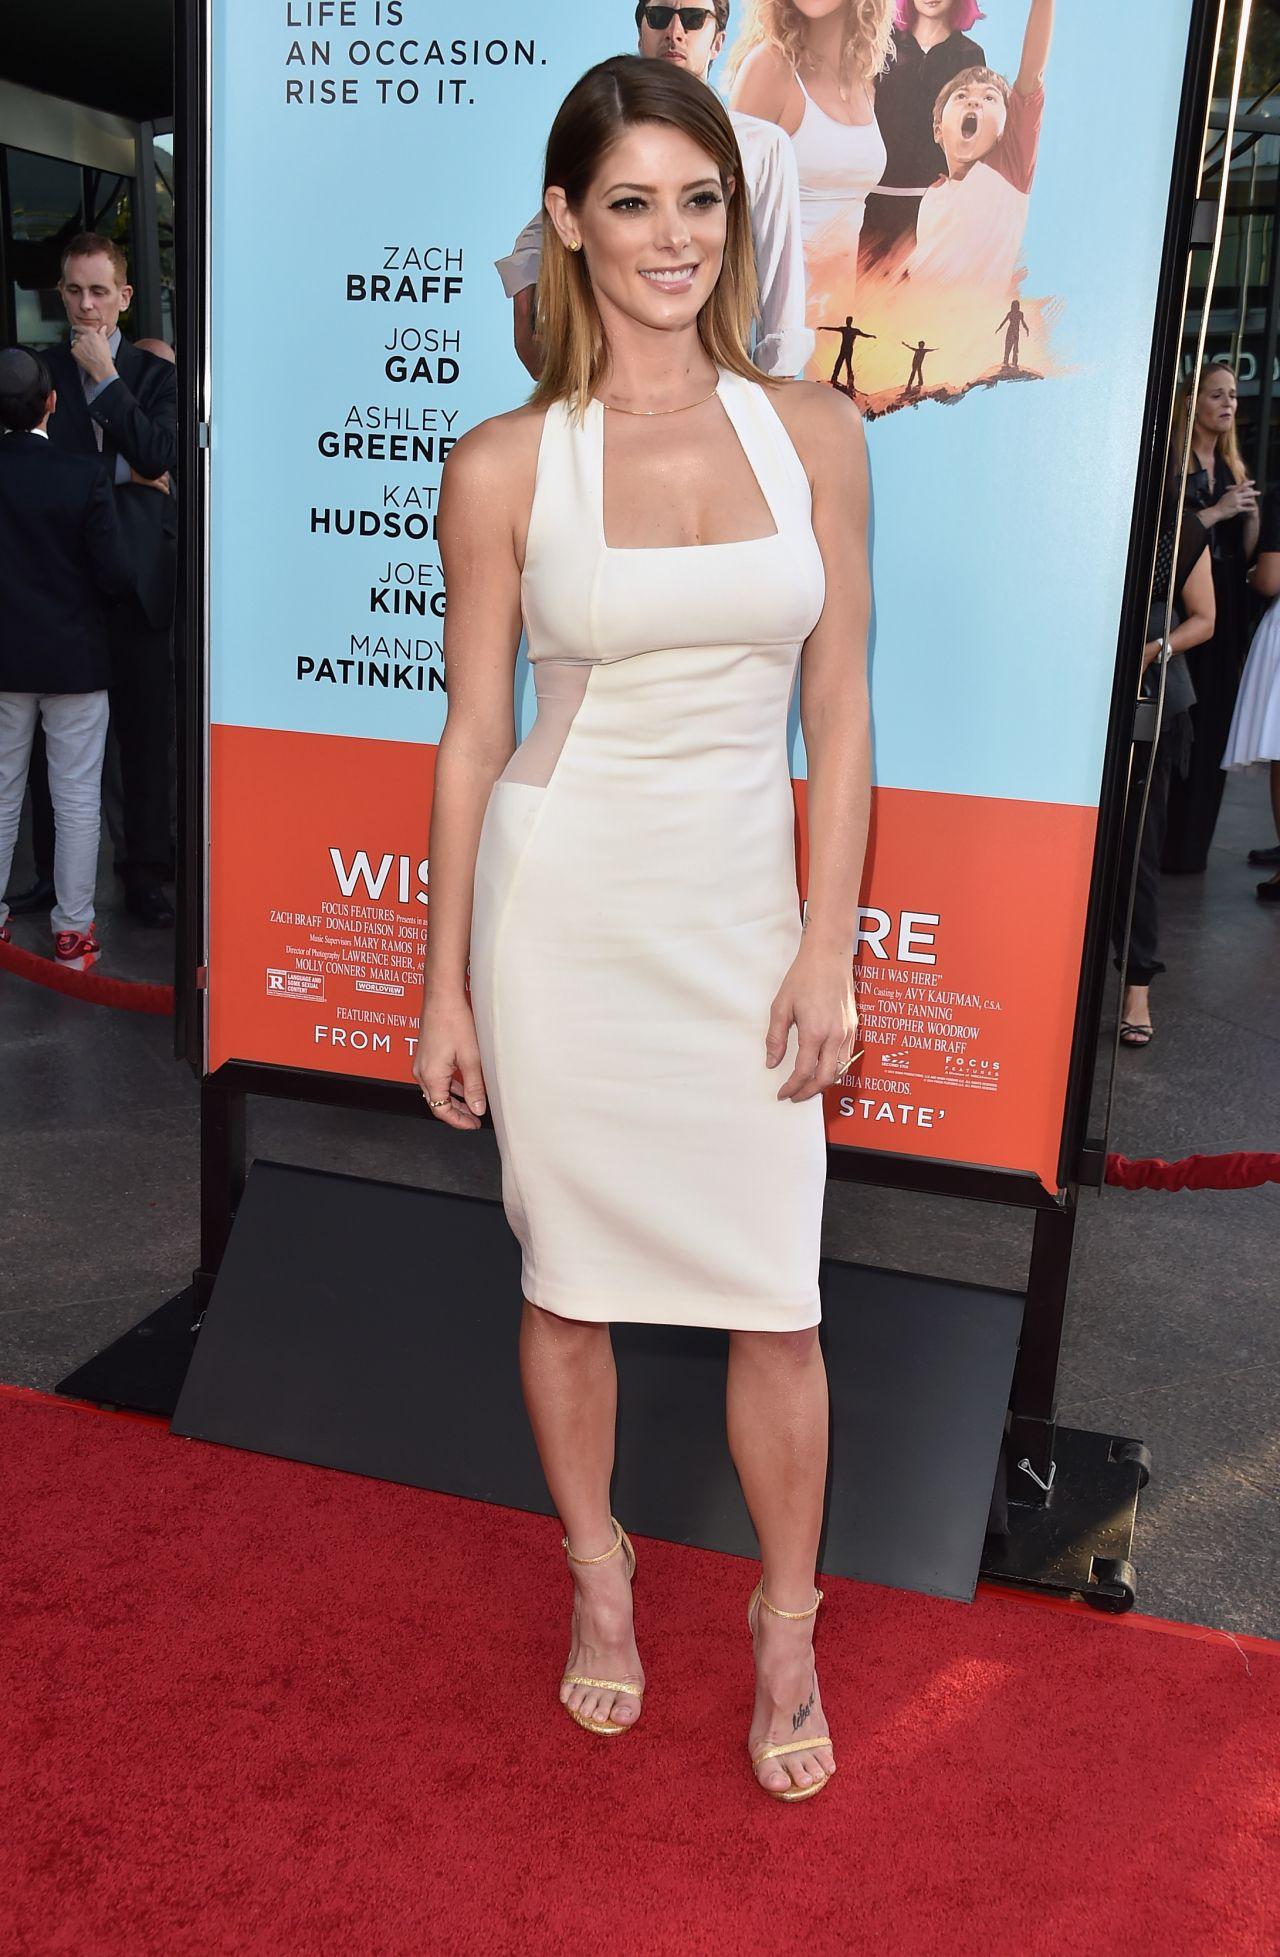 Ashley Greene Wish I Was Here Premiere In Los Angeles